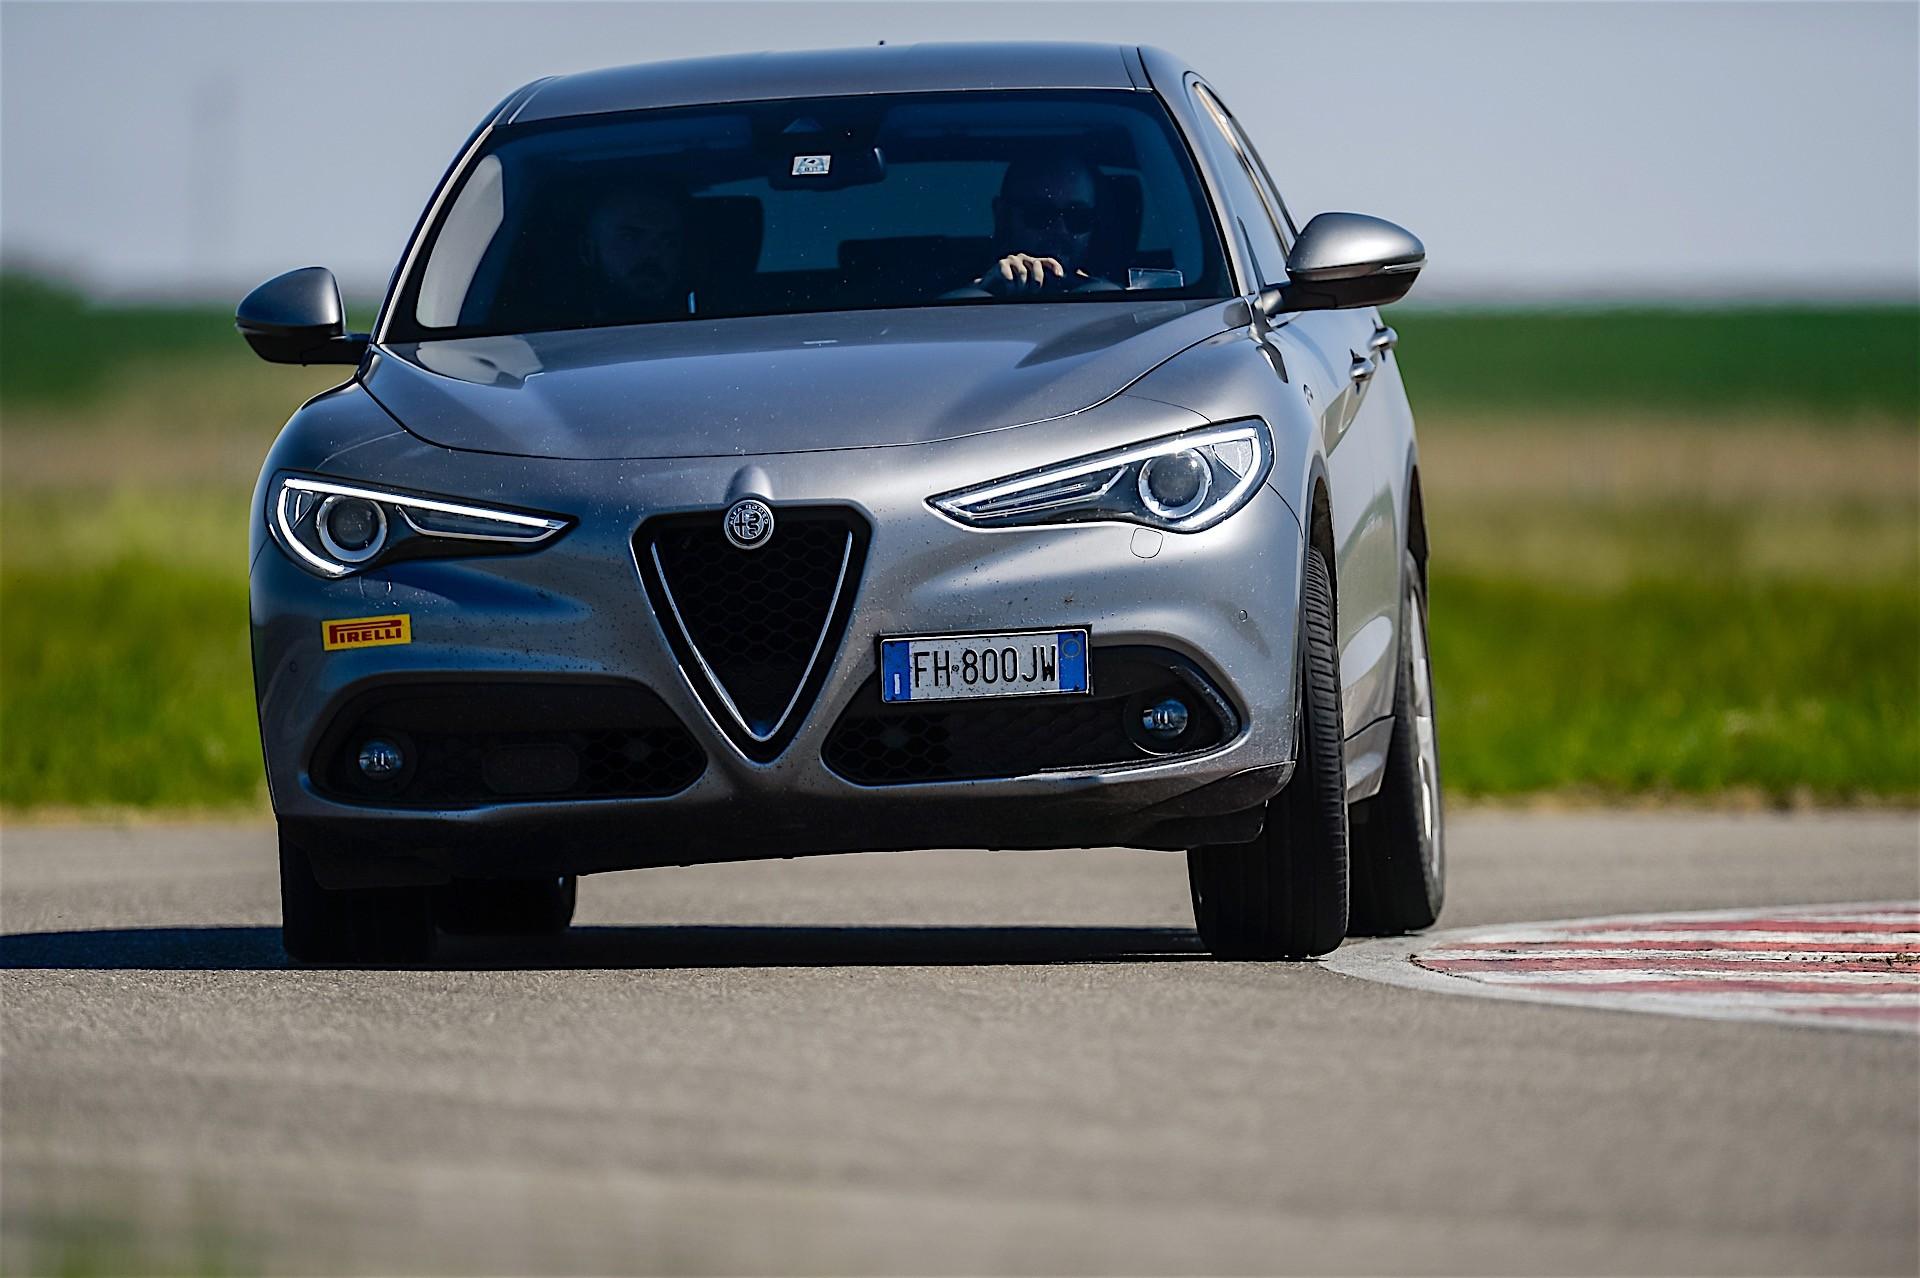 Alfa Romeo Compact Utility Vehicle To Join Giorgio Based Giulietta